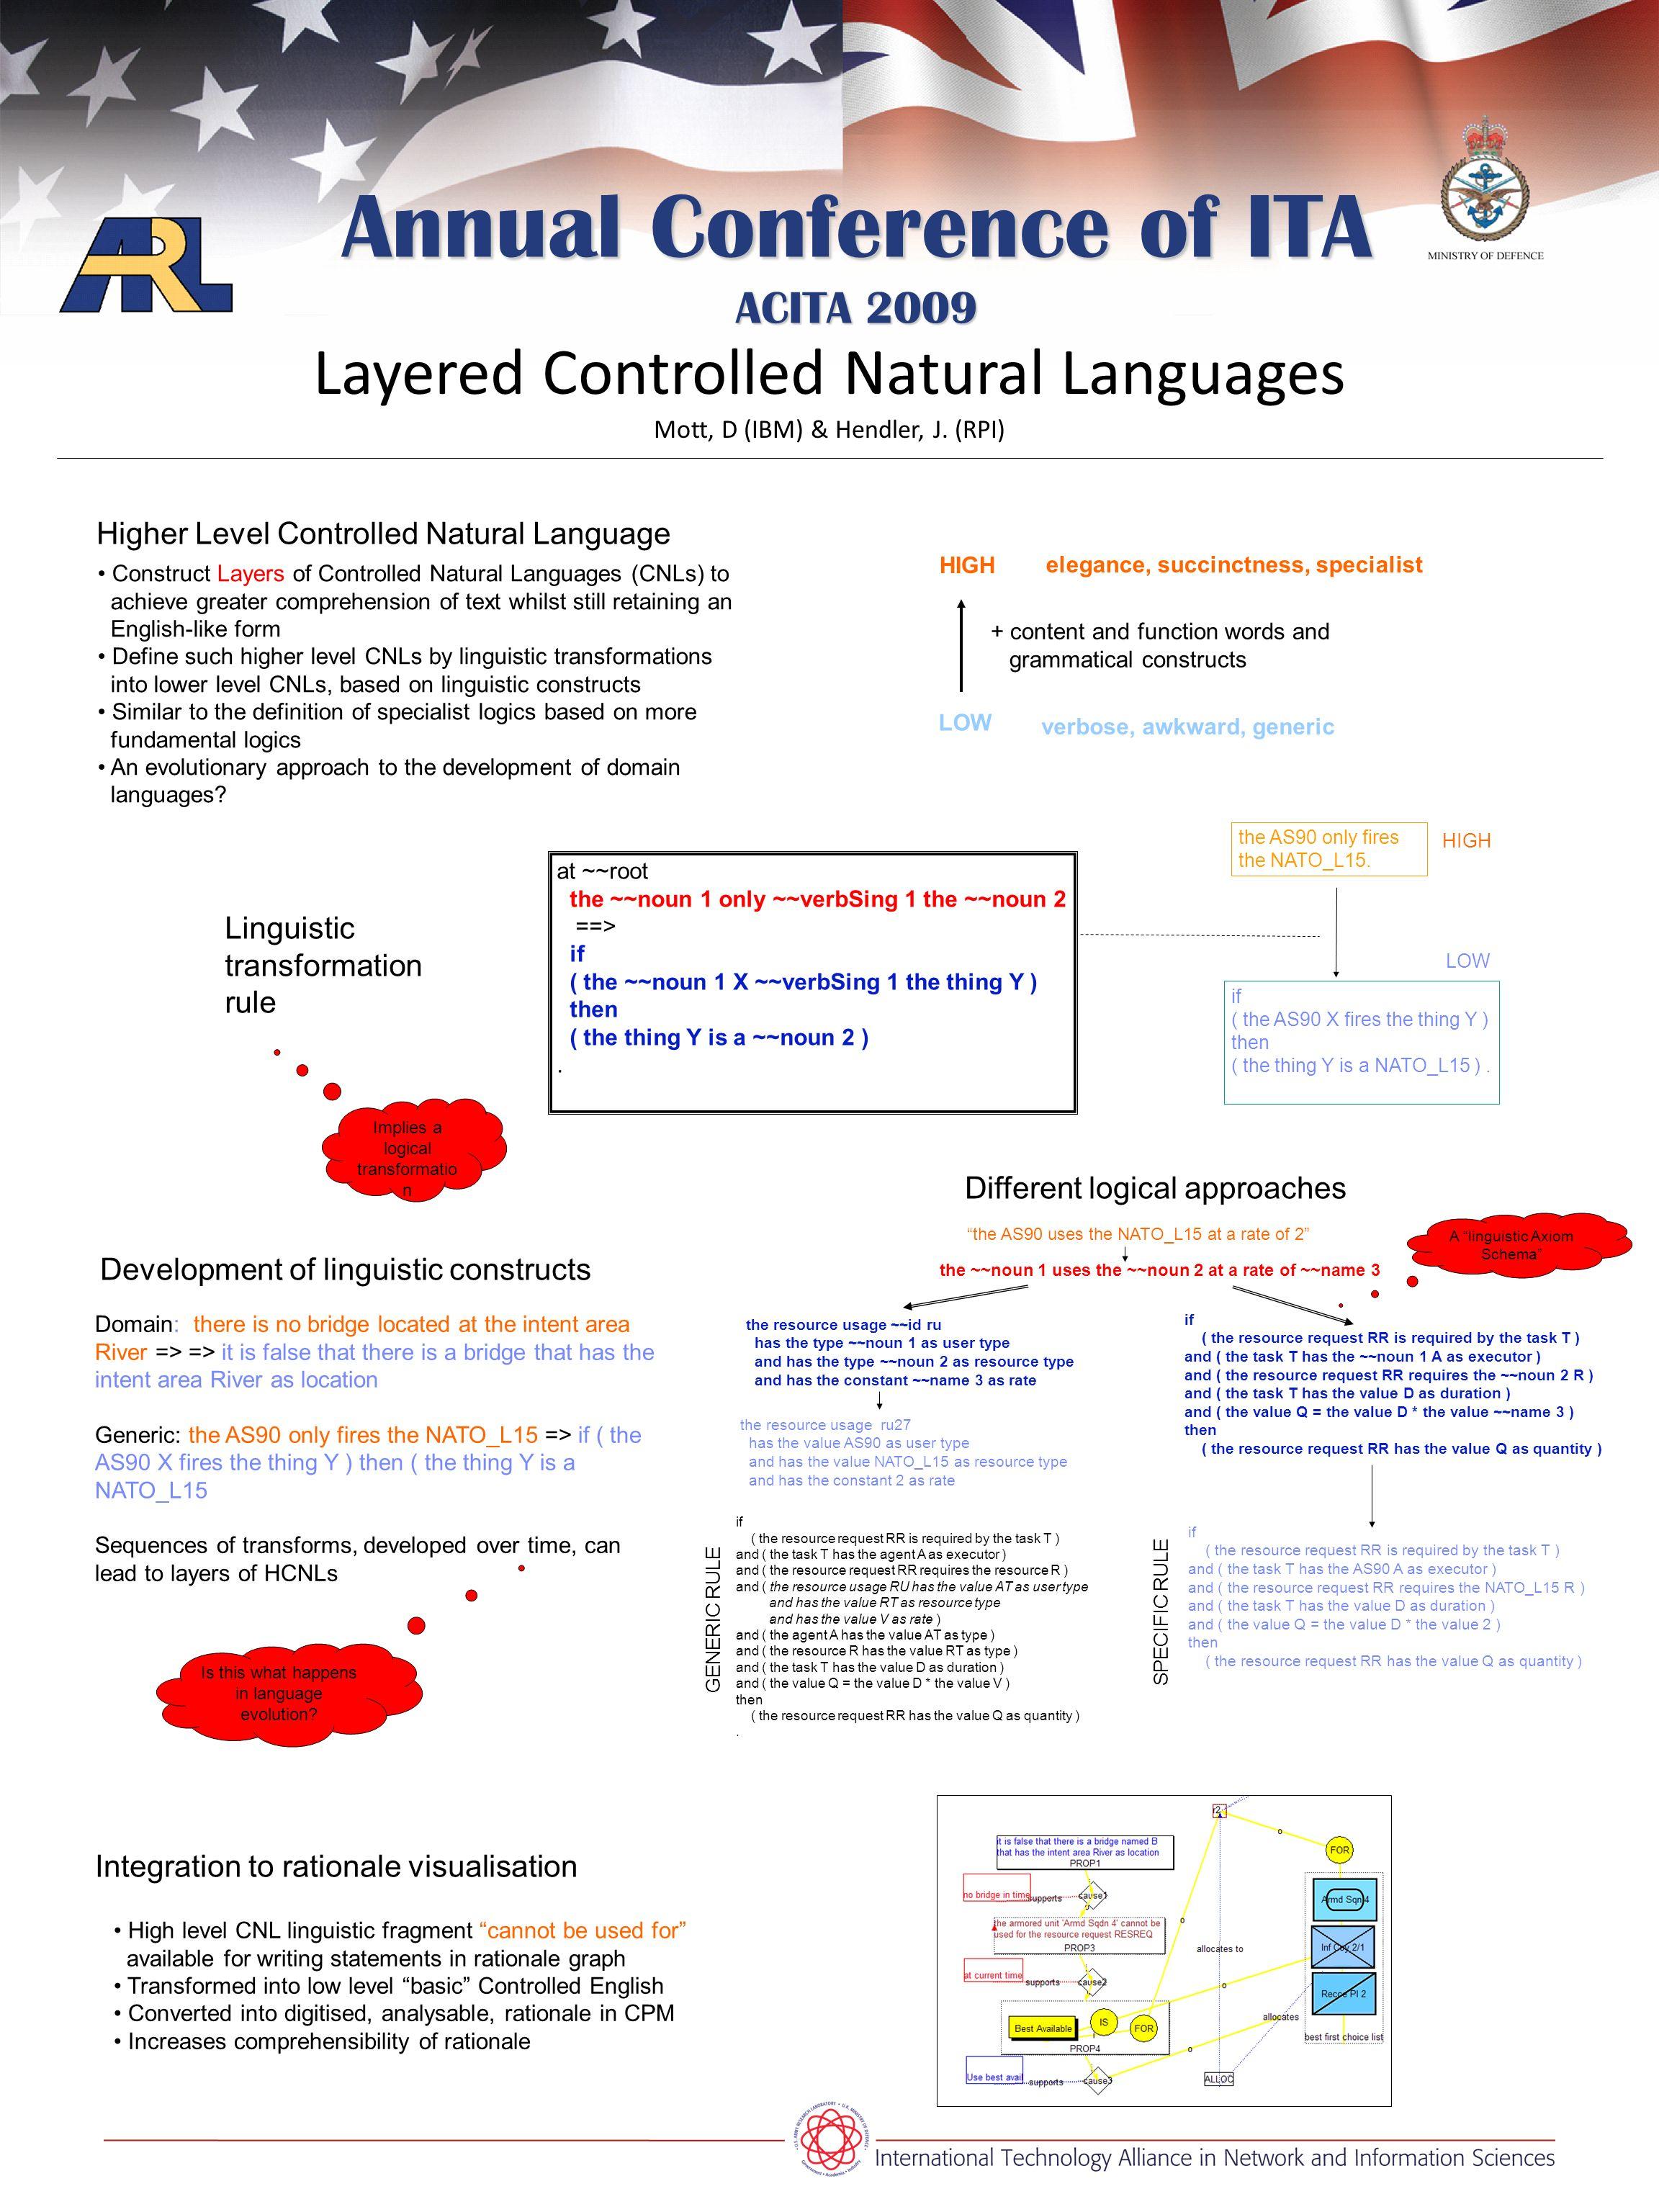 Annual Conference of ITA ACITA 2009 Layered Controlled Natural Languages Mott, D (IBM) & Hendler, J.